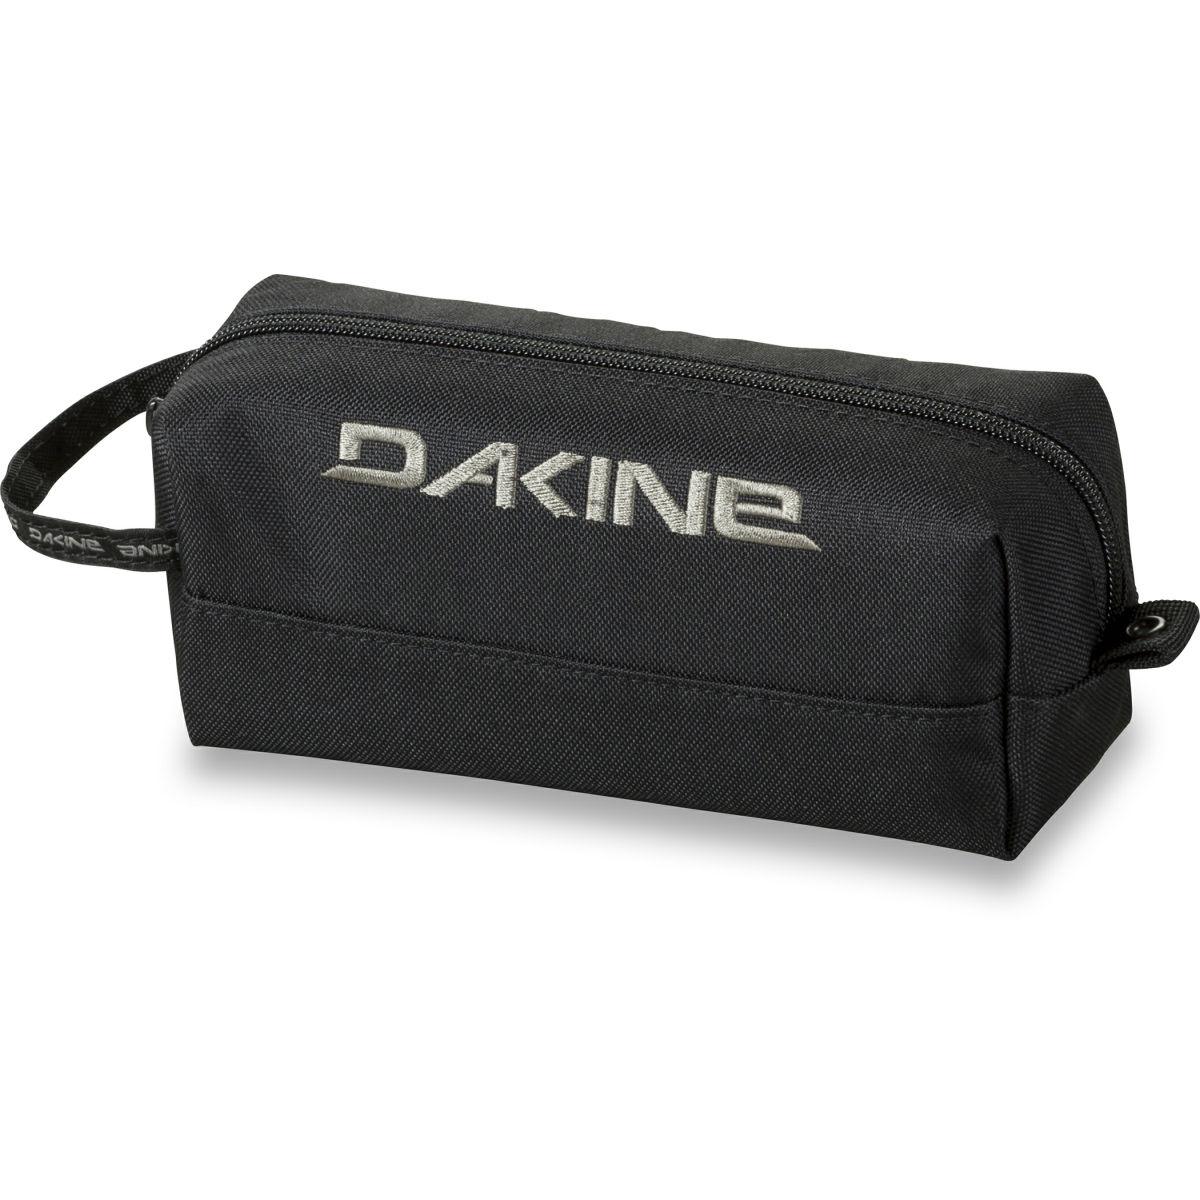 Image of Dakine Accessory Case Black Grösse Einmalige Grösse